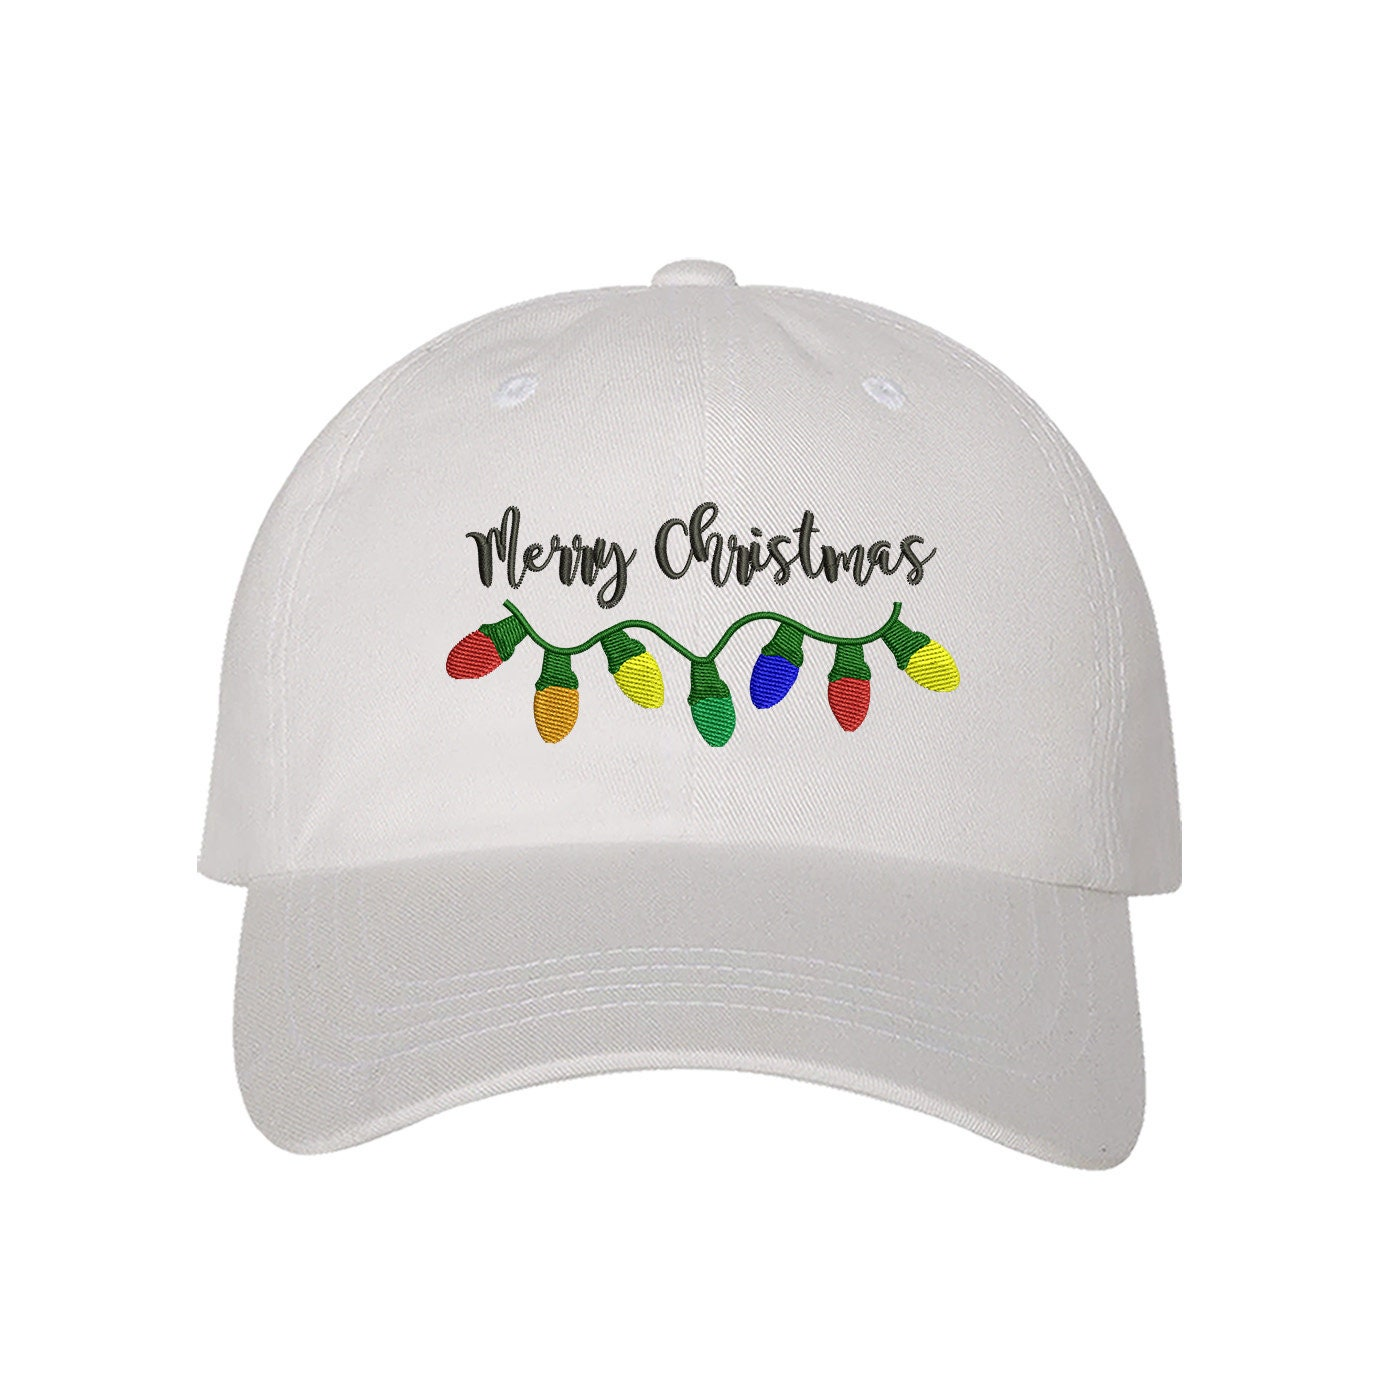 Merry Christmas Hats Christmas Outfit Caps Holidays Baseball Hat ... 4567ff0b376